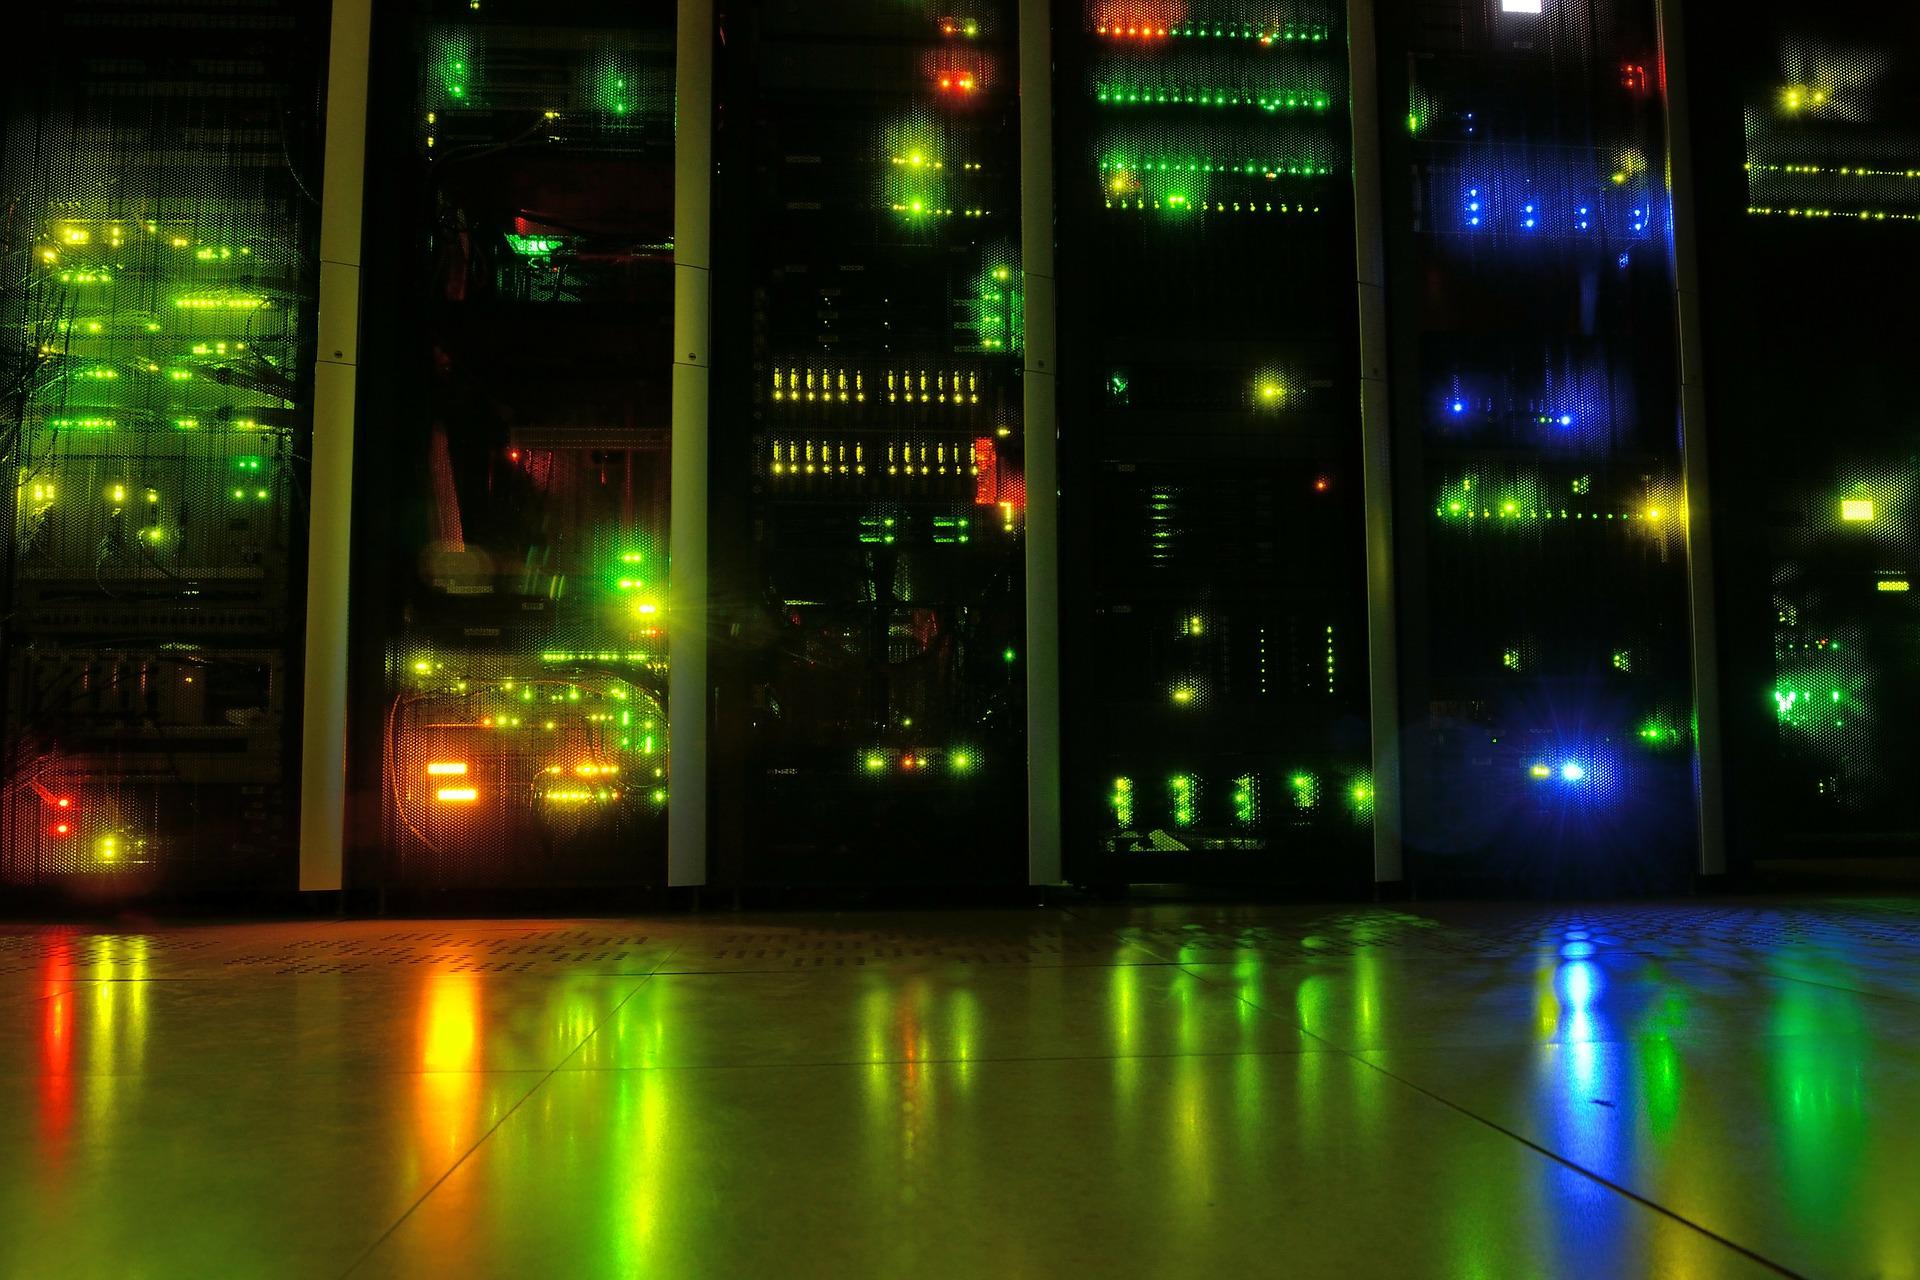 server-90389_1920.jpg